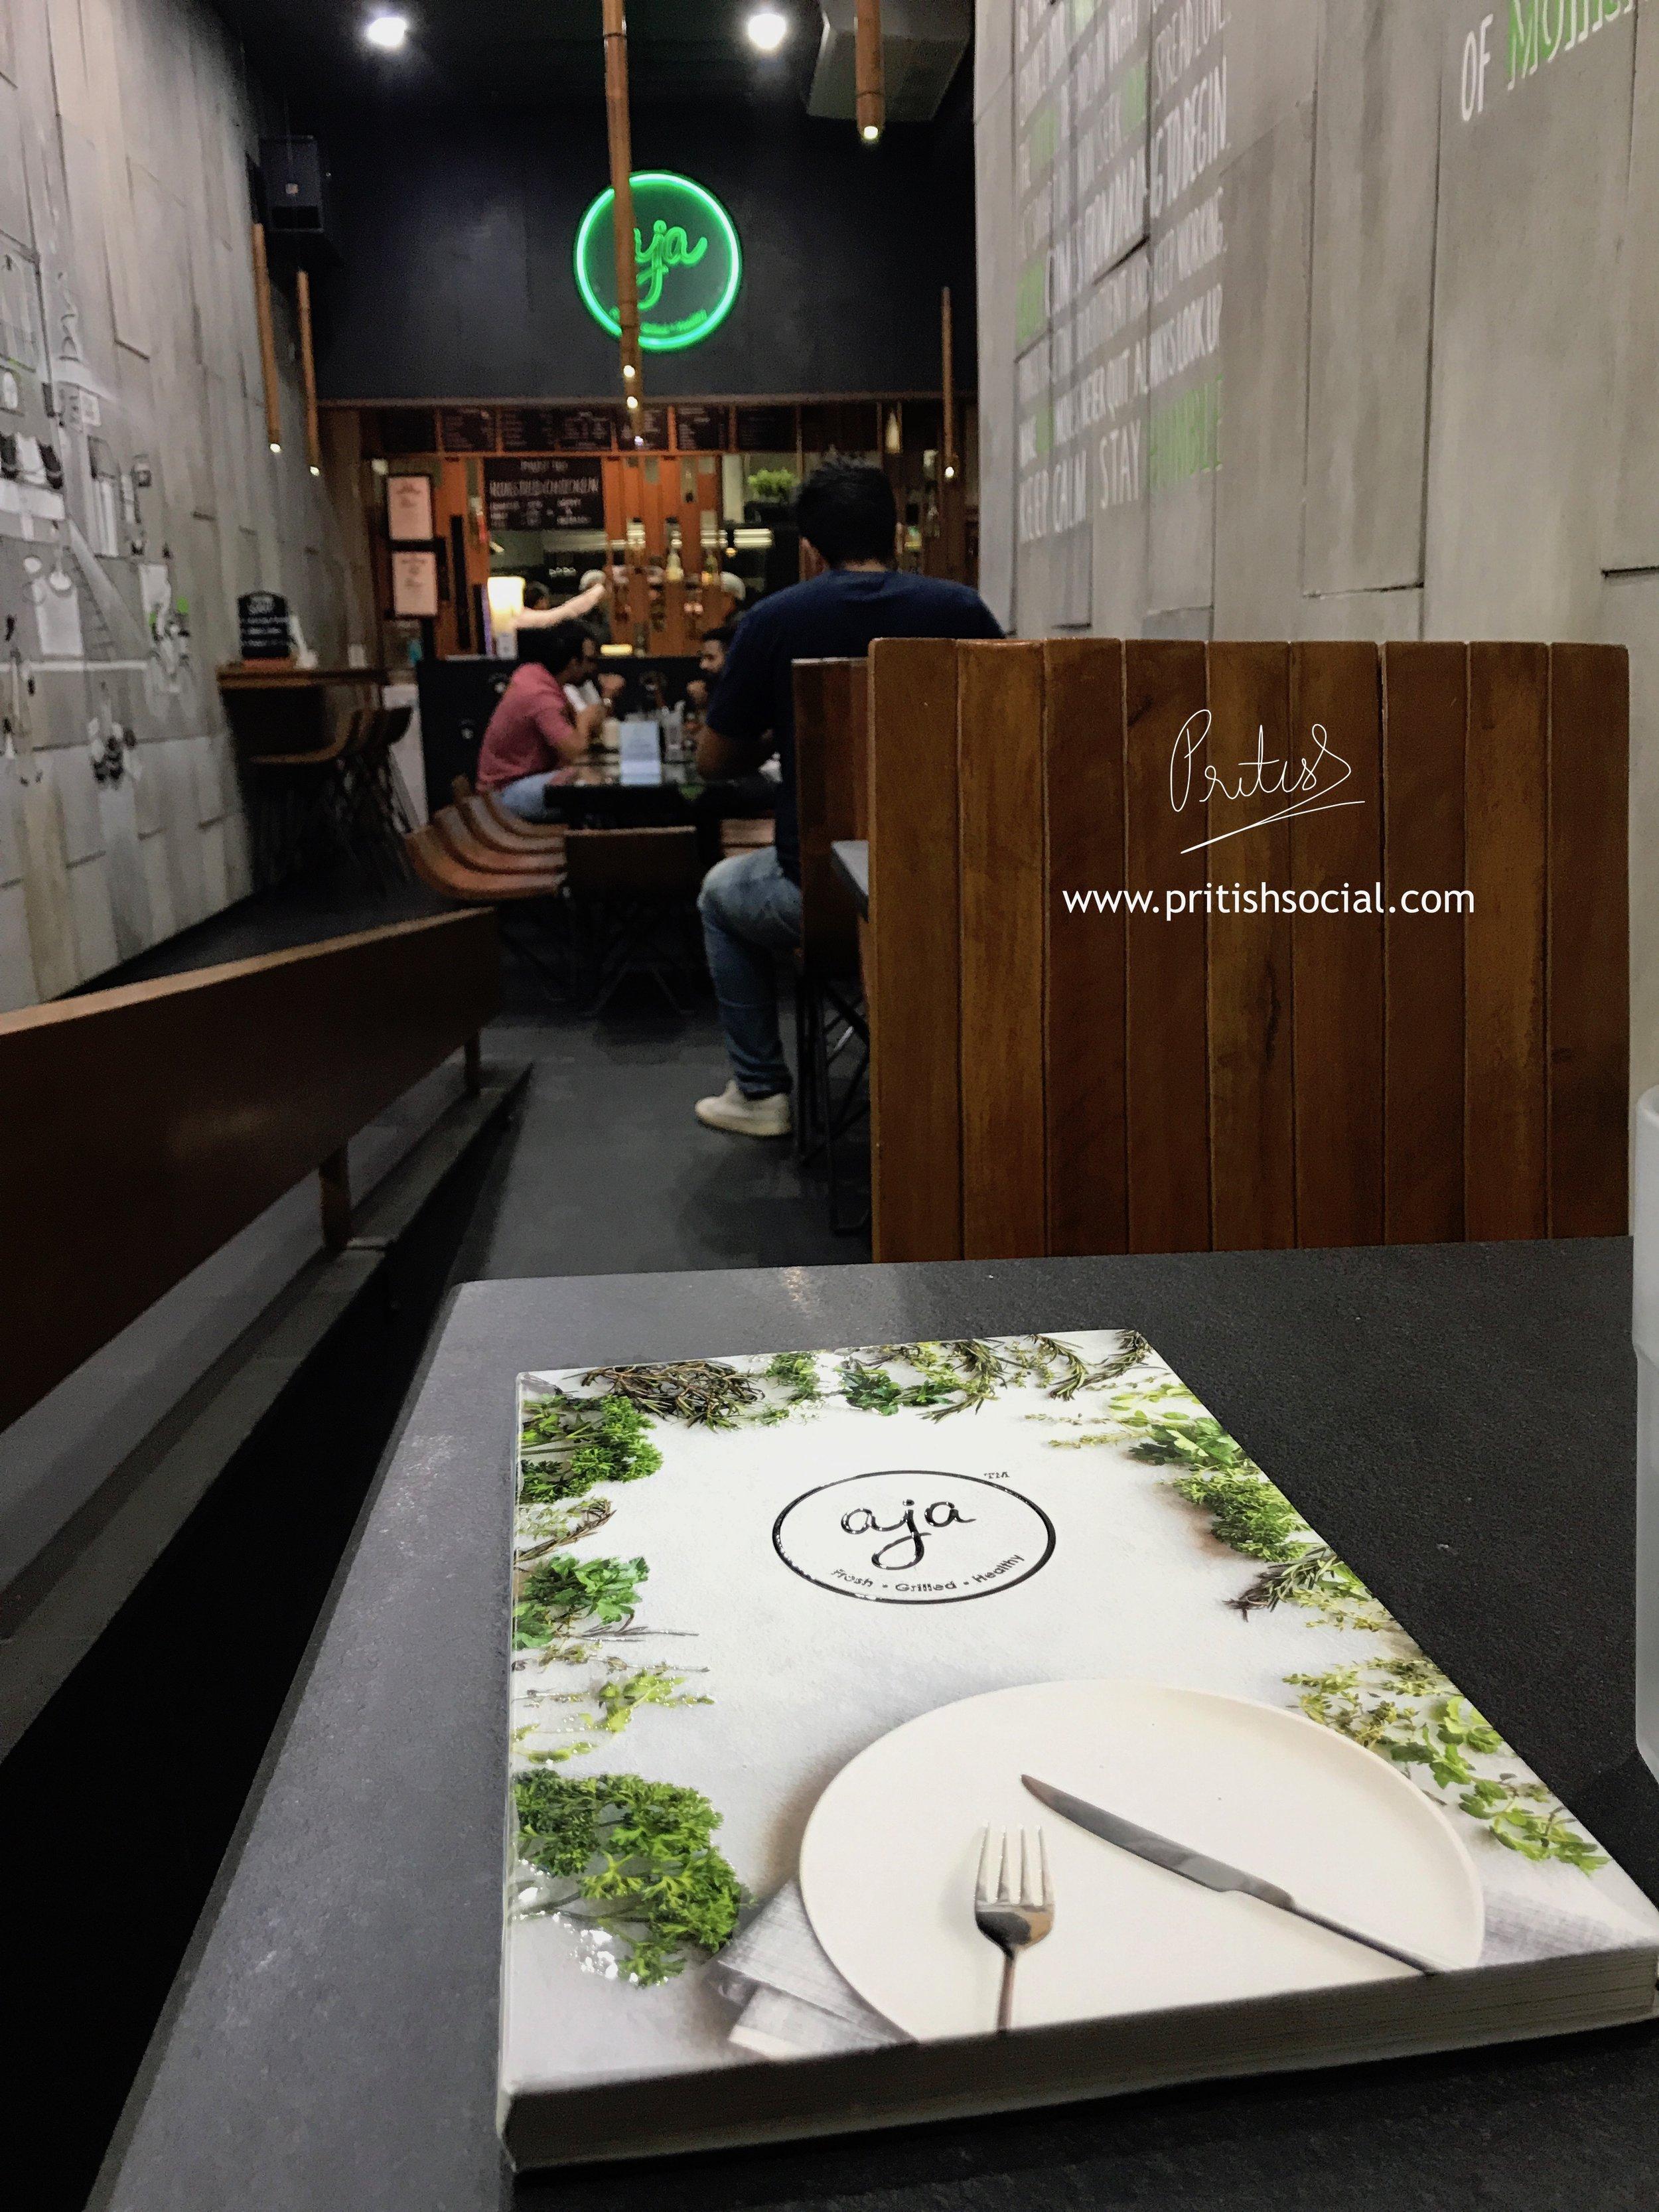 aja-chandigarh-pritishsocial-travel-food-blogger-photo-1.jpg